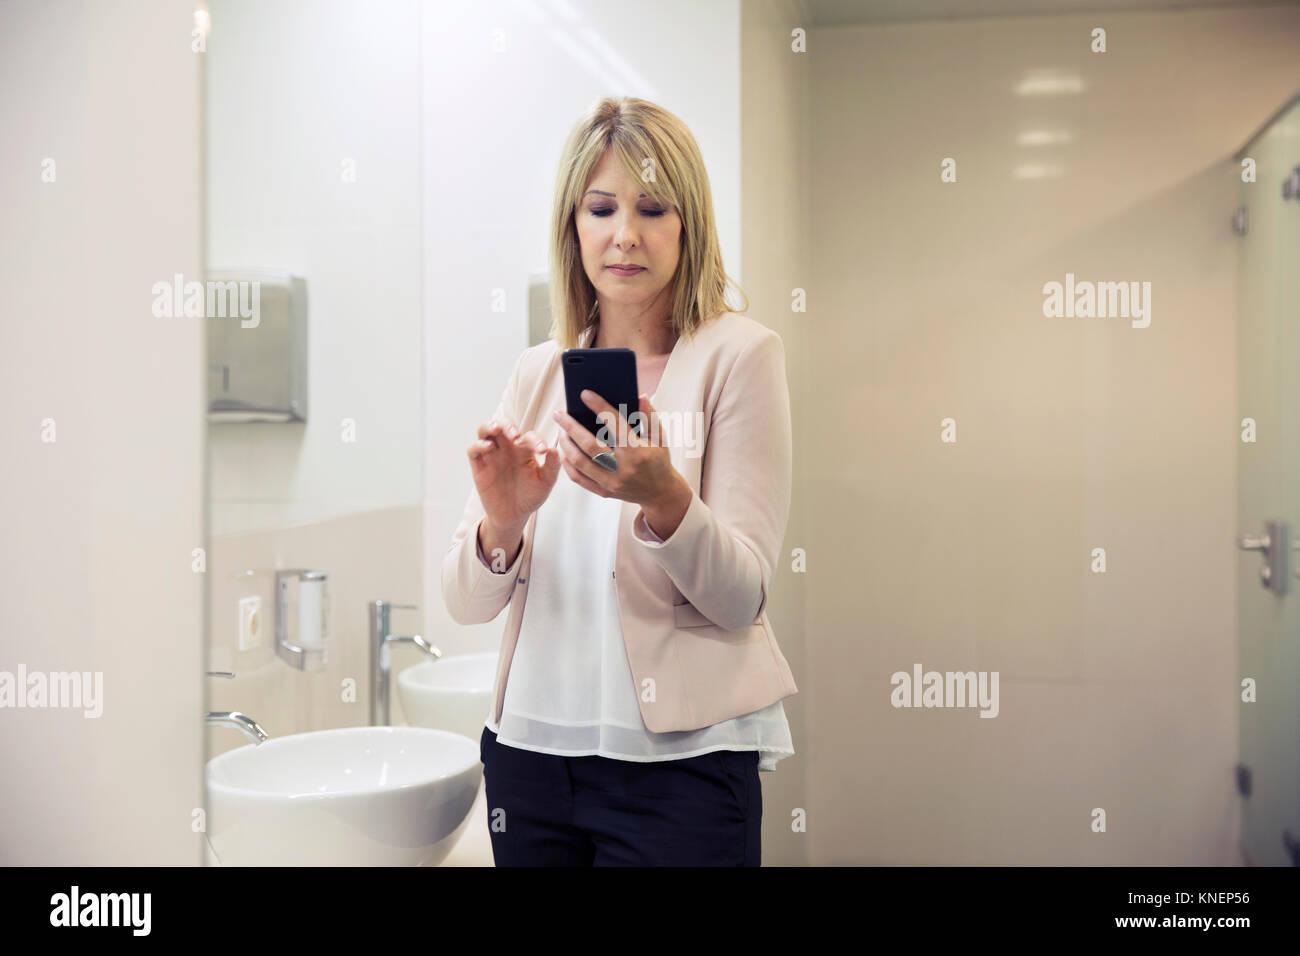 Bathroom Mature Photo Woman